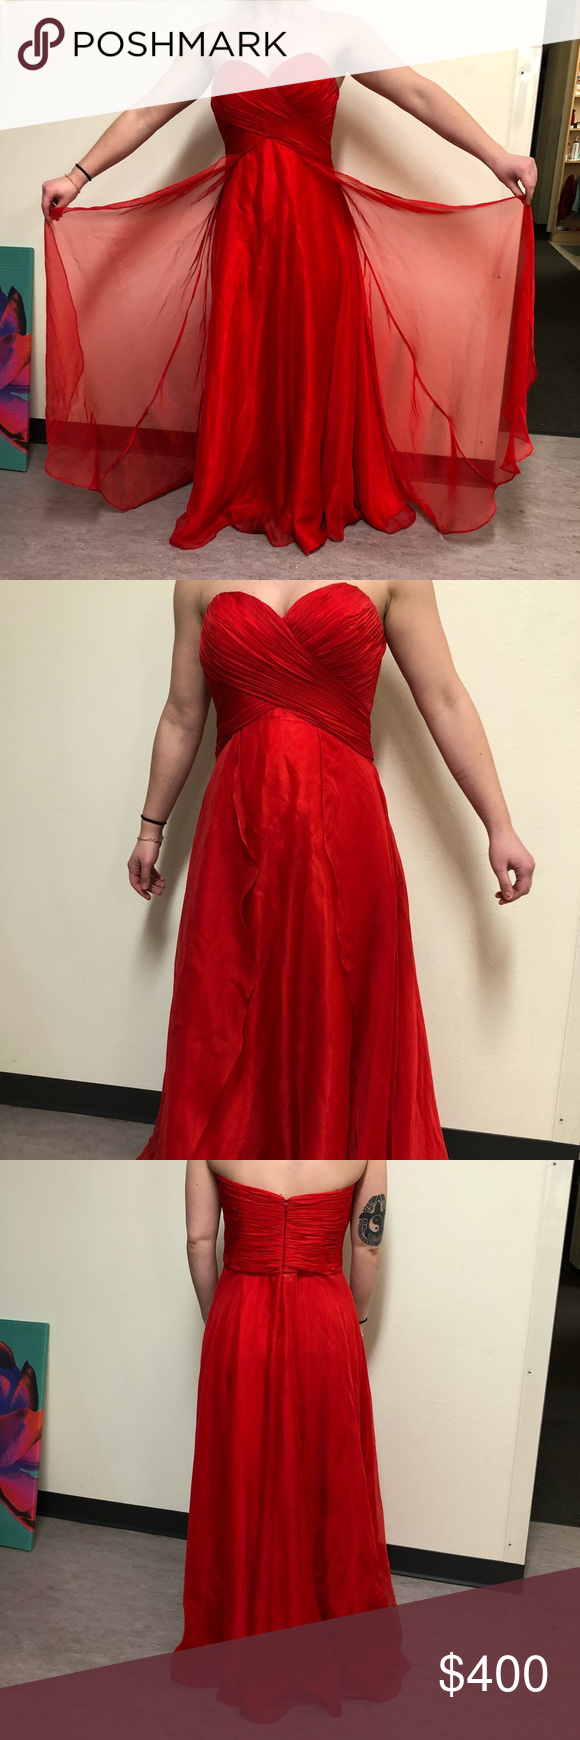 Alyce paris red strapless prom dress strapless prom dresses paris